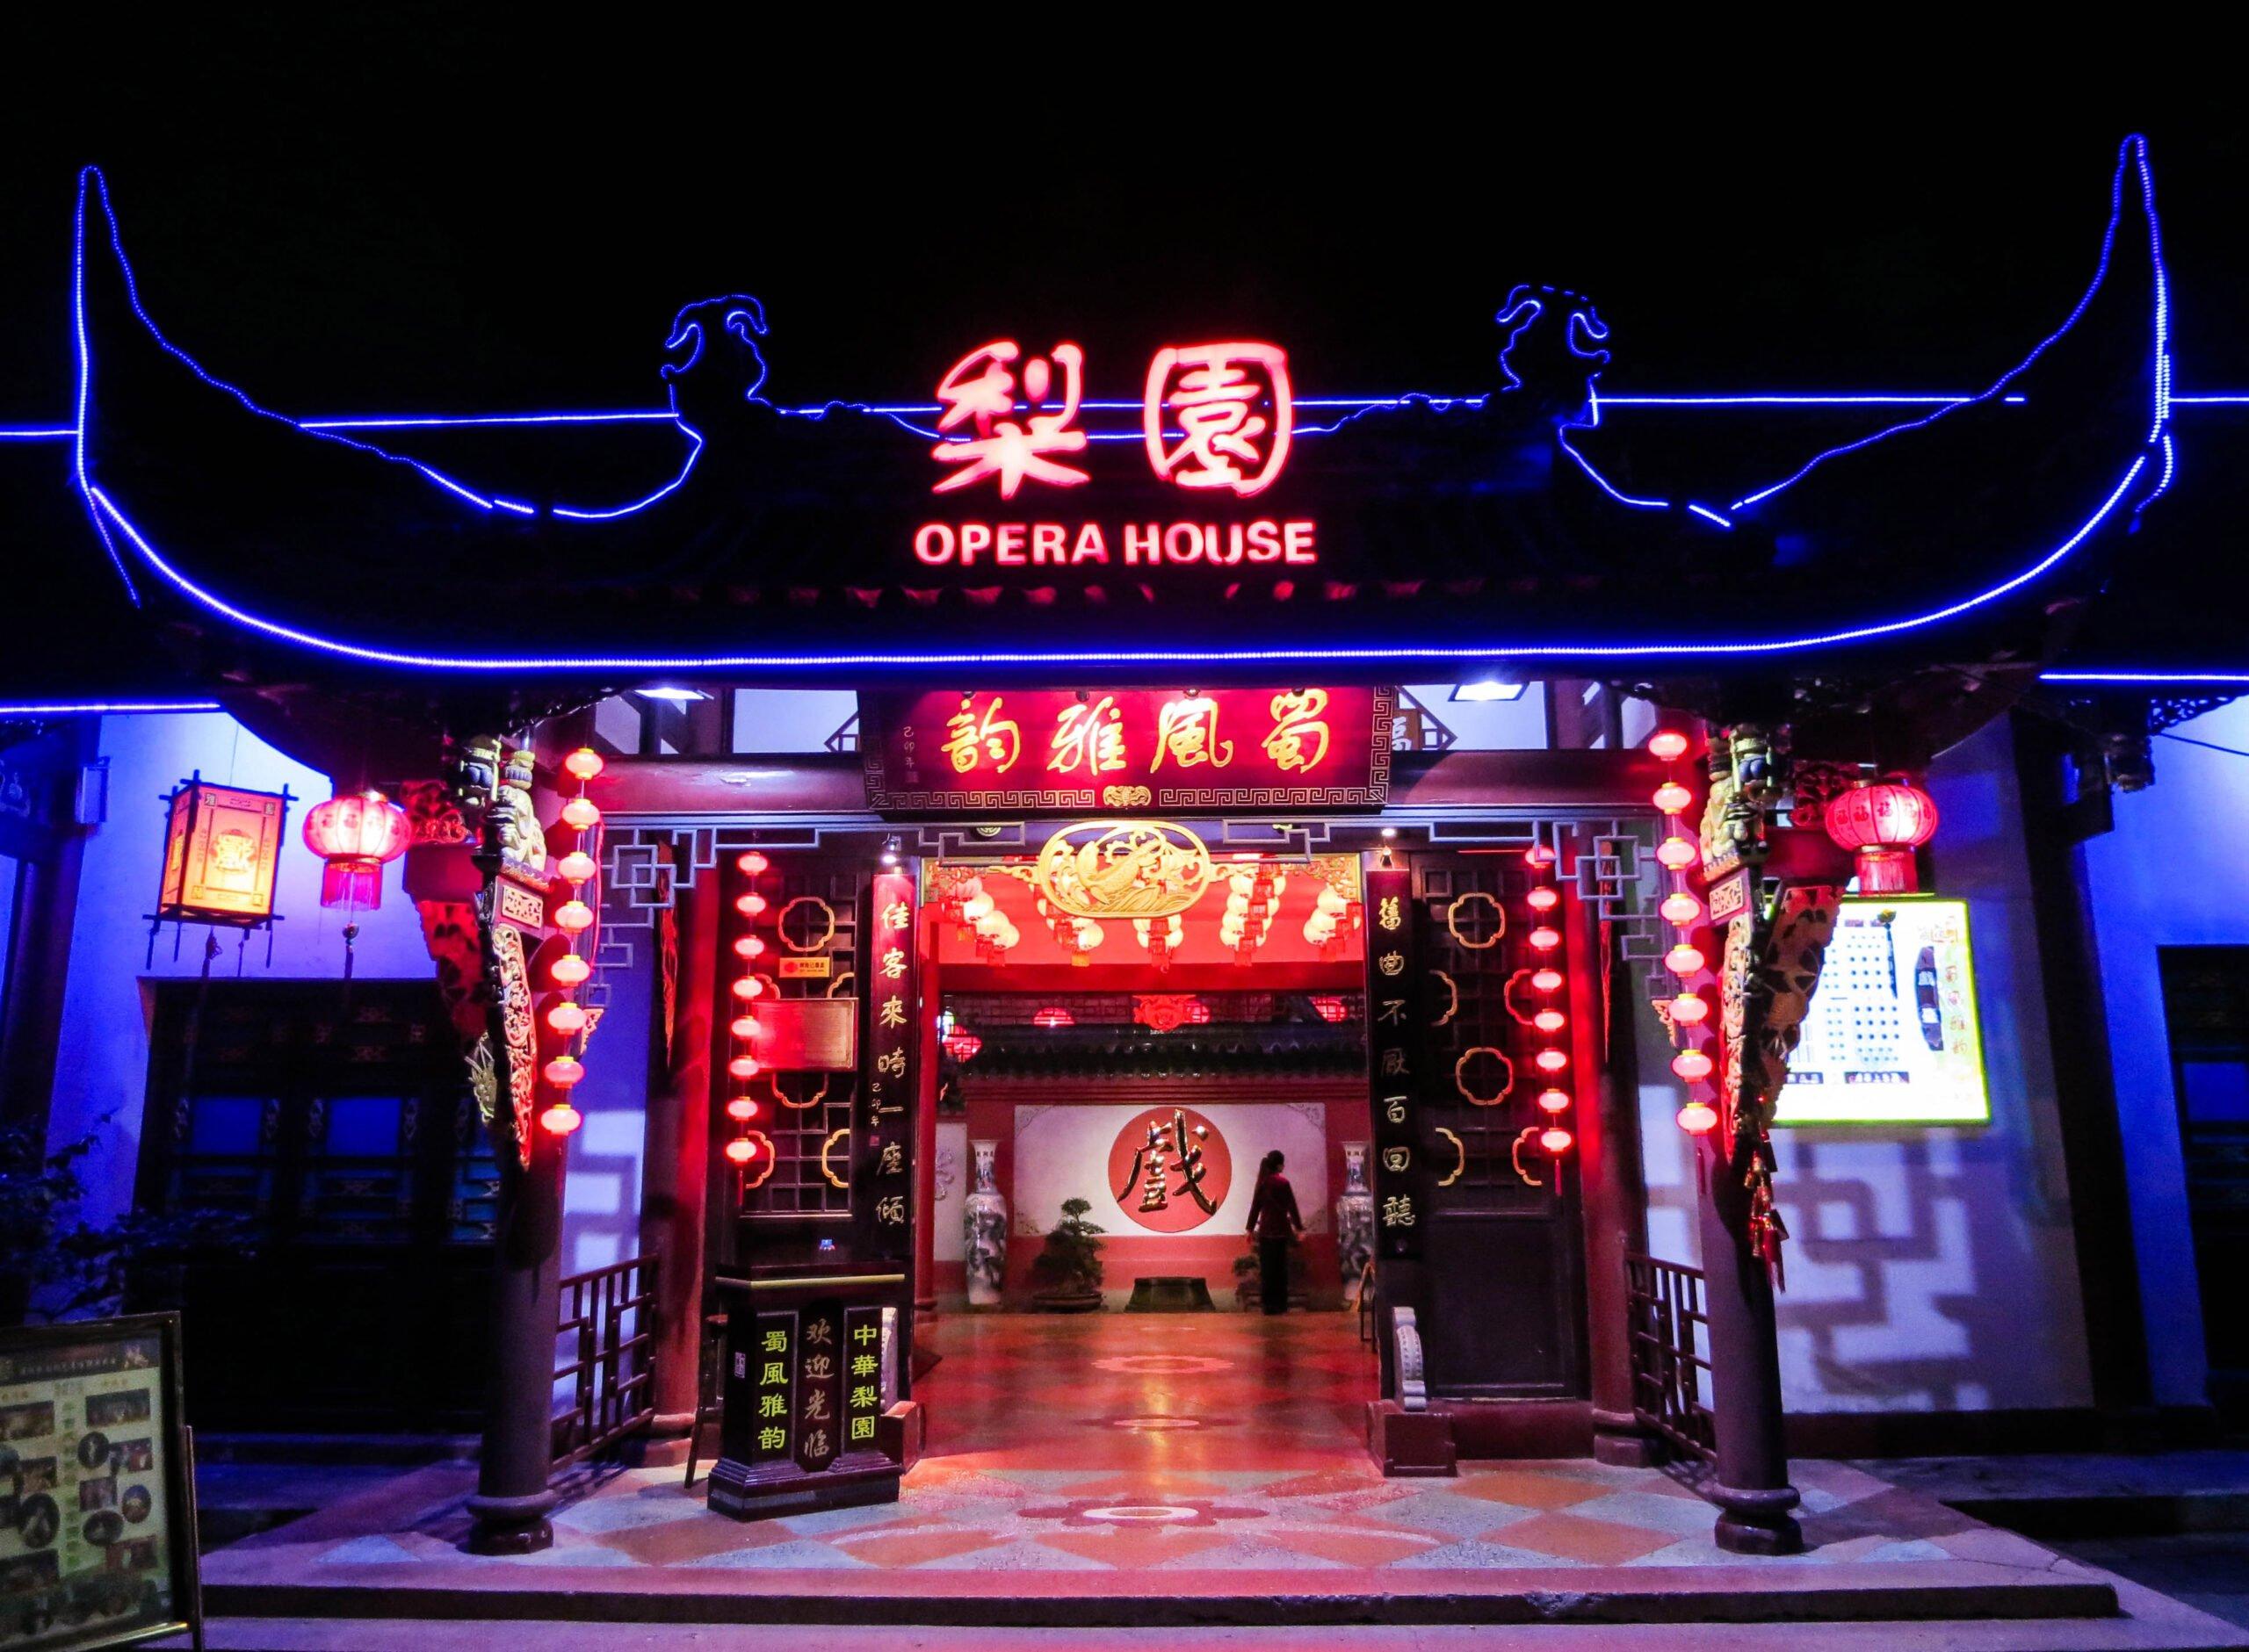 Chengdu Opera House - CC0 / Public Domain